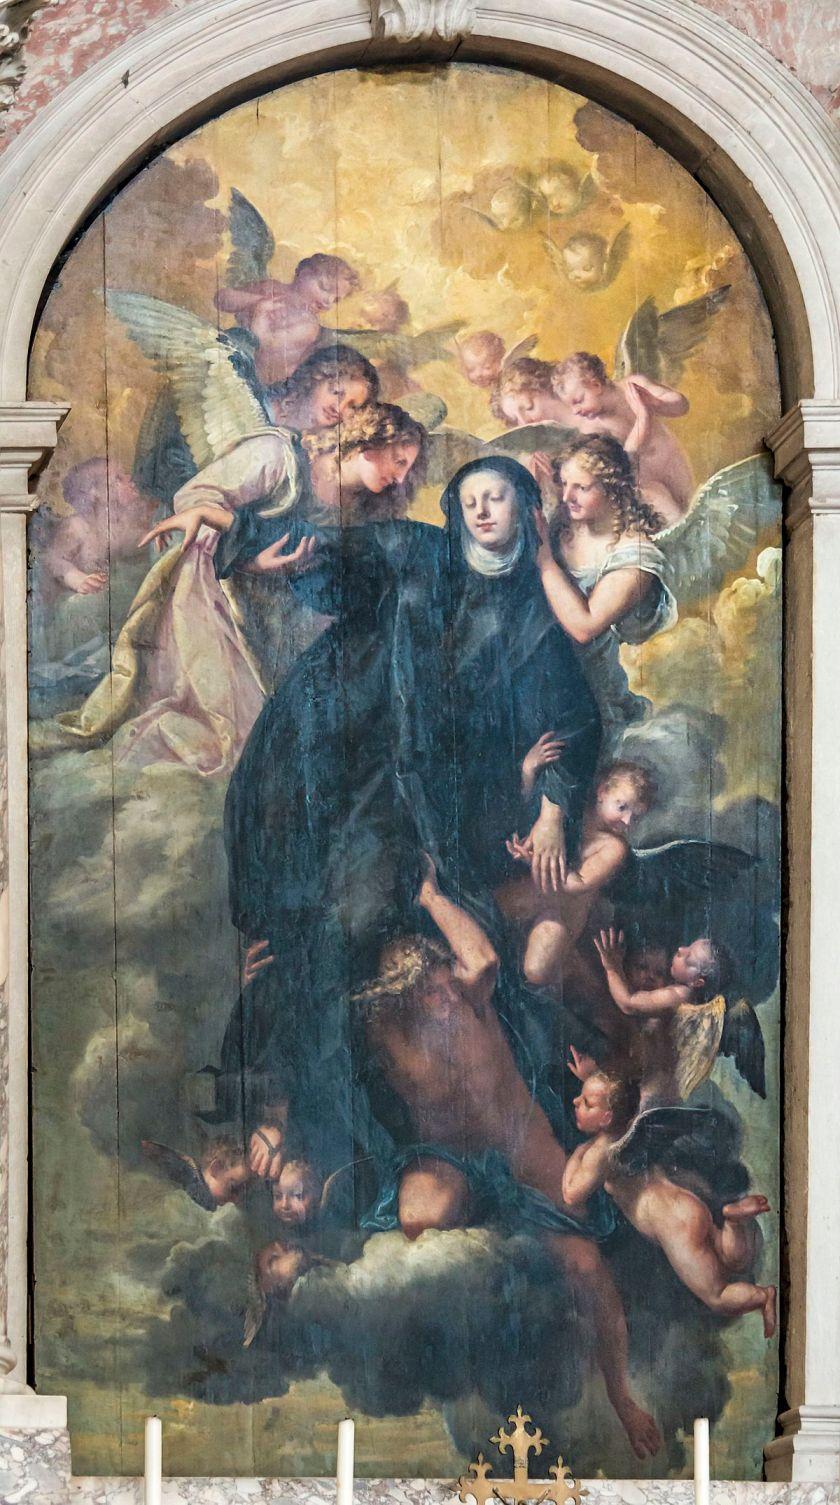 Santa_Giustina_(Padua)_-_Ecstasy_of_St._Gertrude_by_Pietro_Liberi